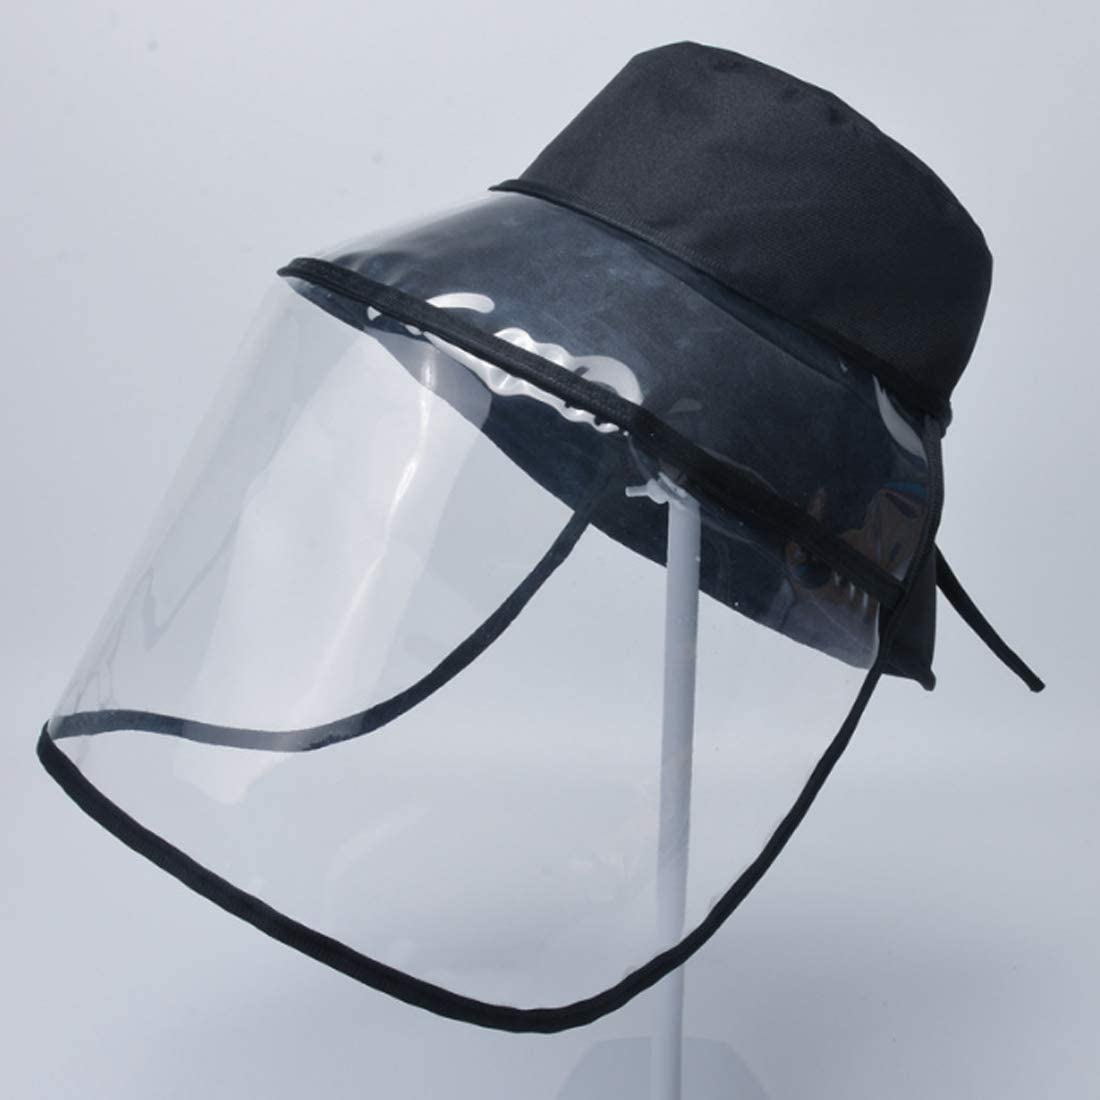 Huicai Prevent Saliva Faceshield Fishing Sun Protect Cap Baseball Hat Cover